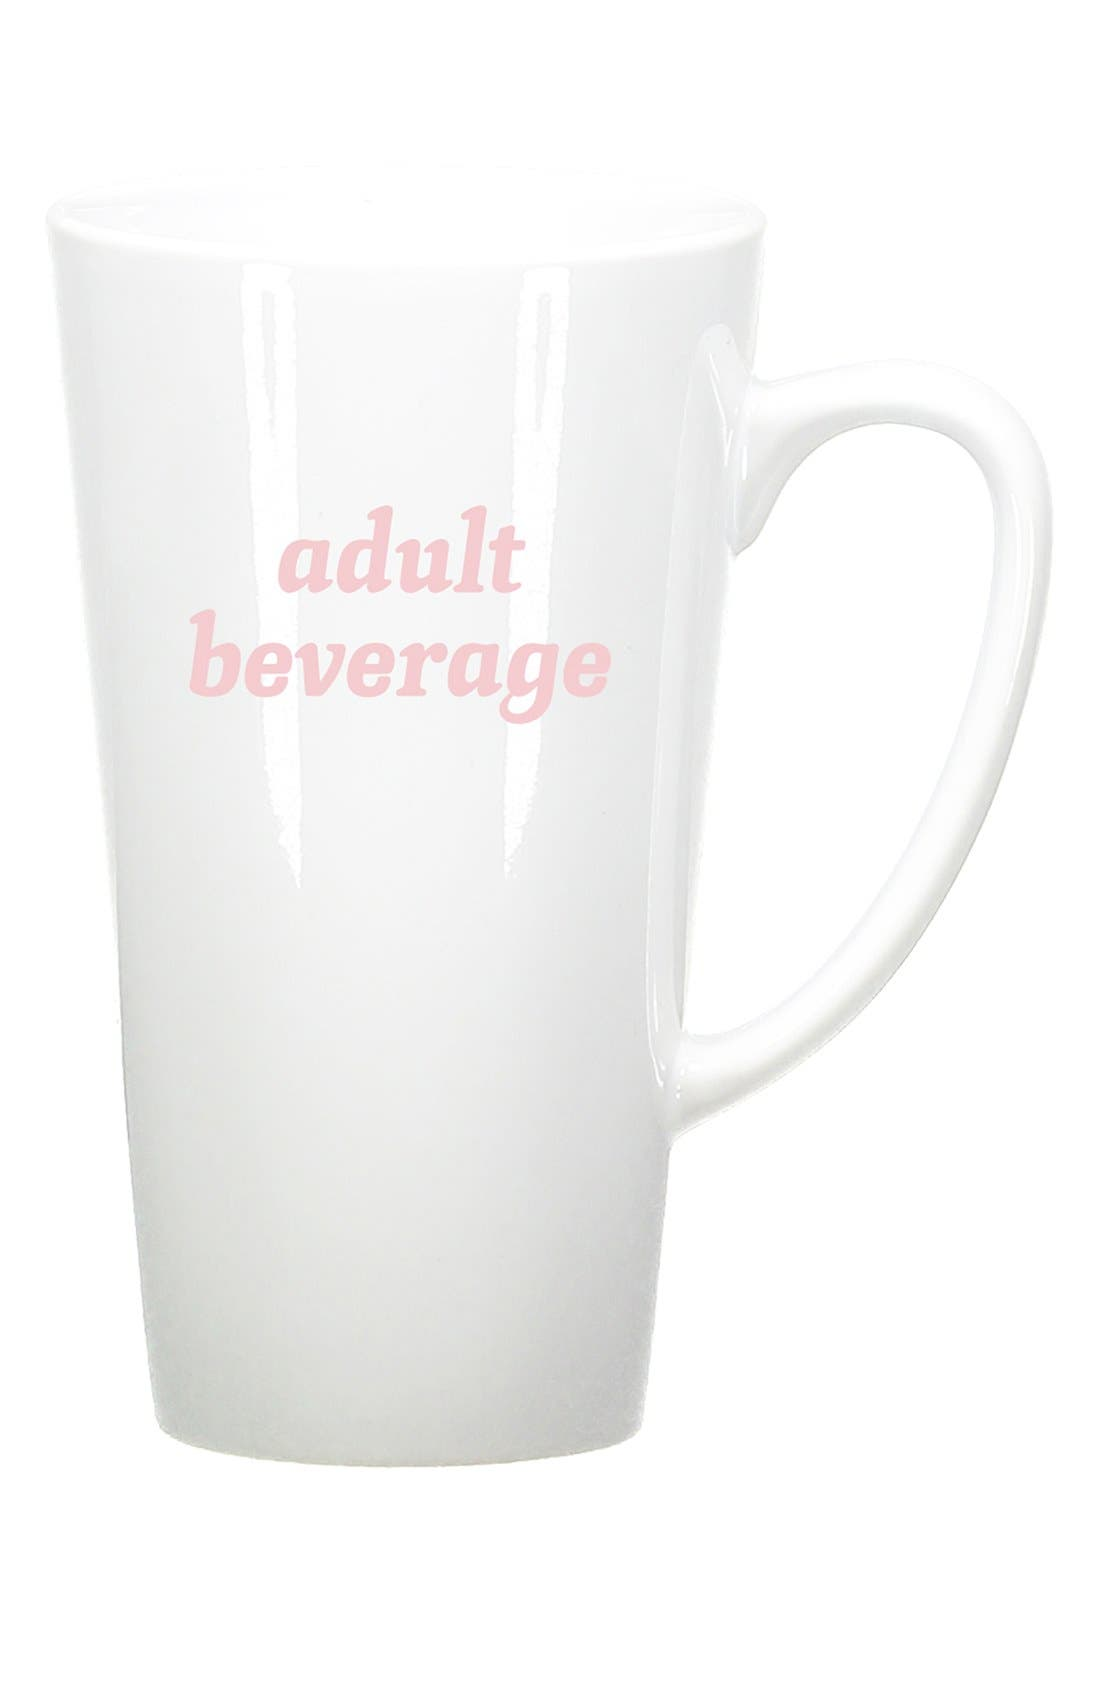 Main Image - Bow & Drape 'Adult Beverage' Ceramic Mug